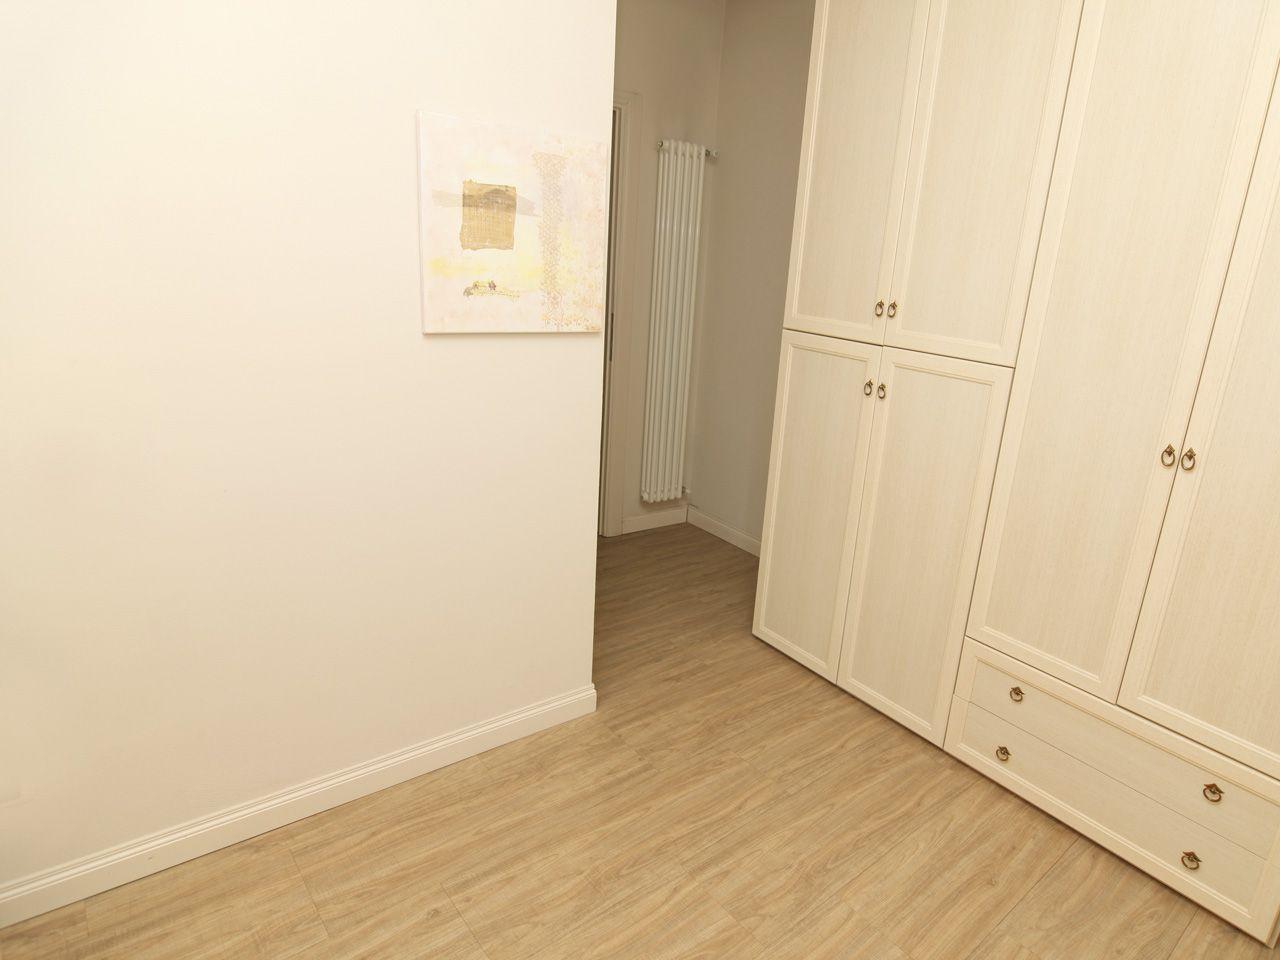 Apartment in center of Pallanza - study room